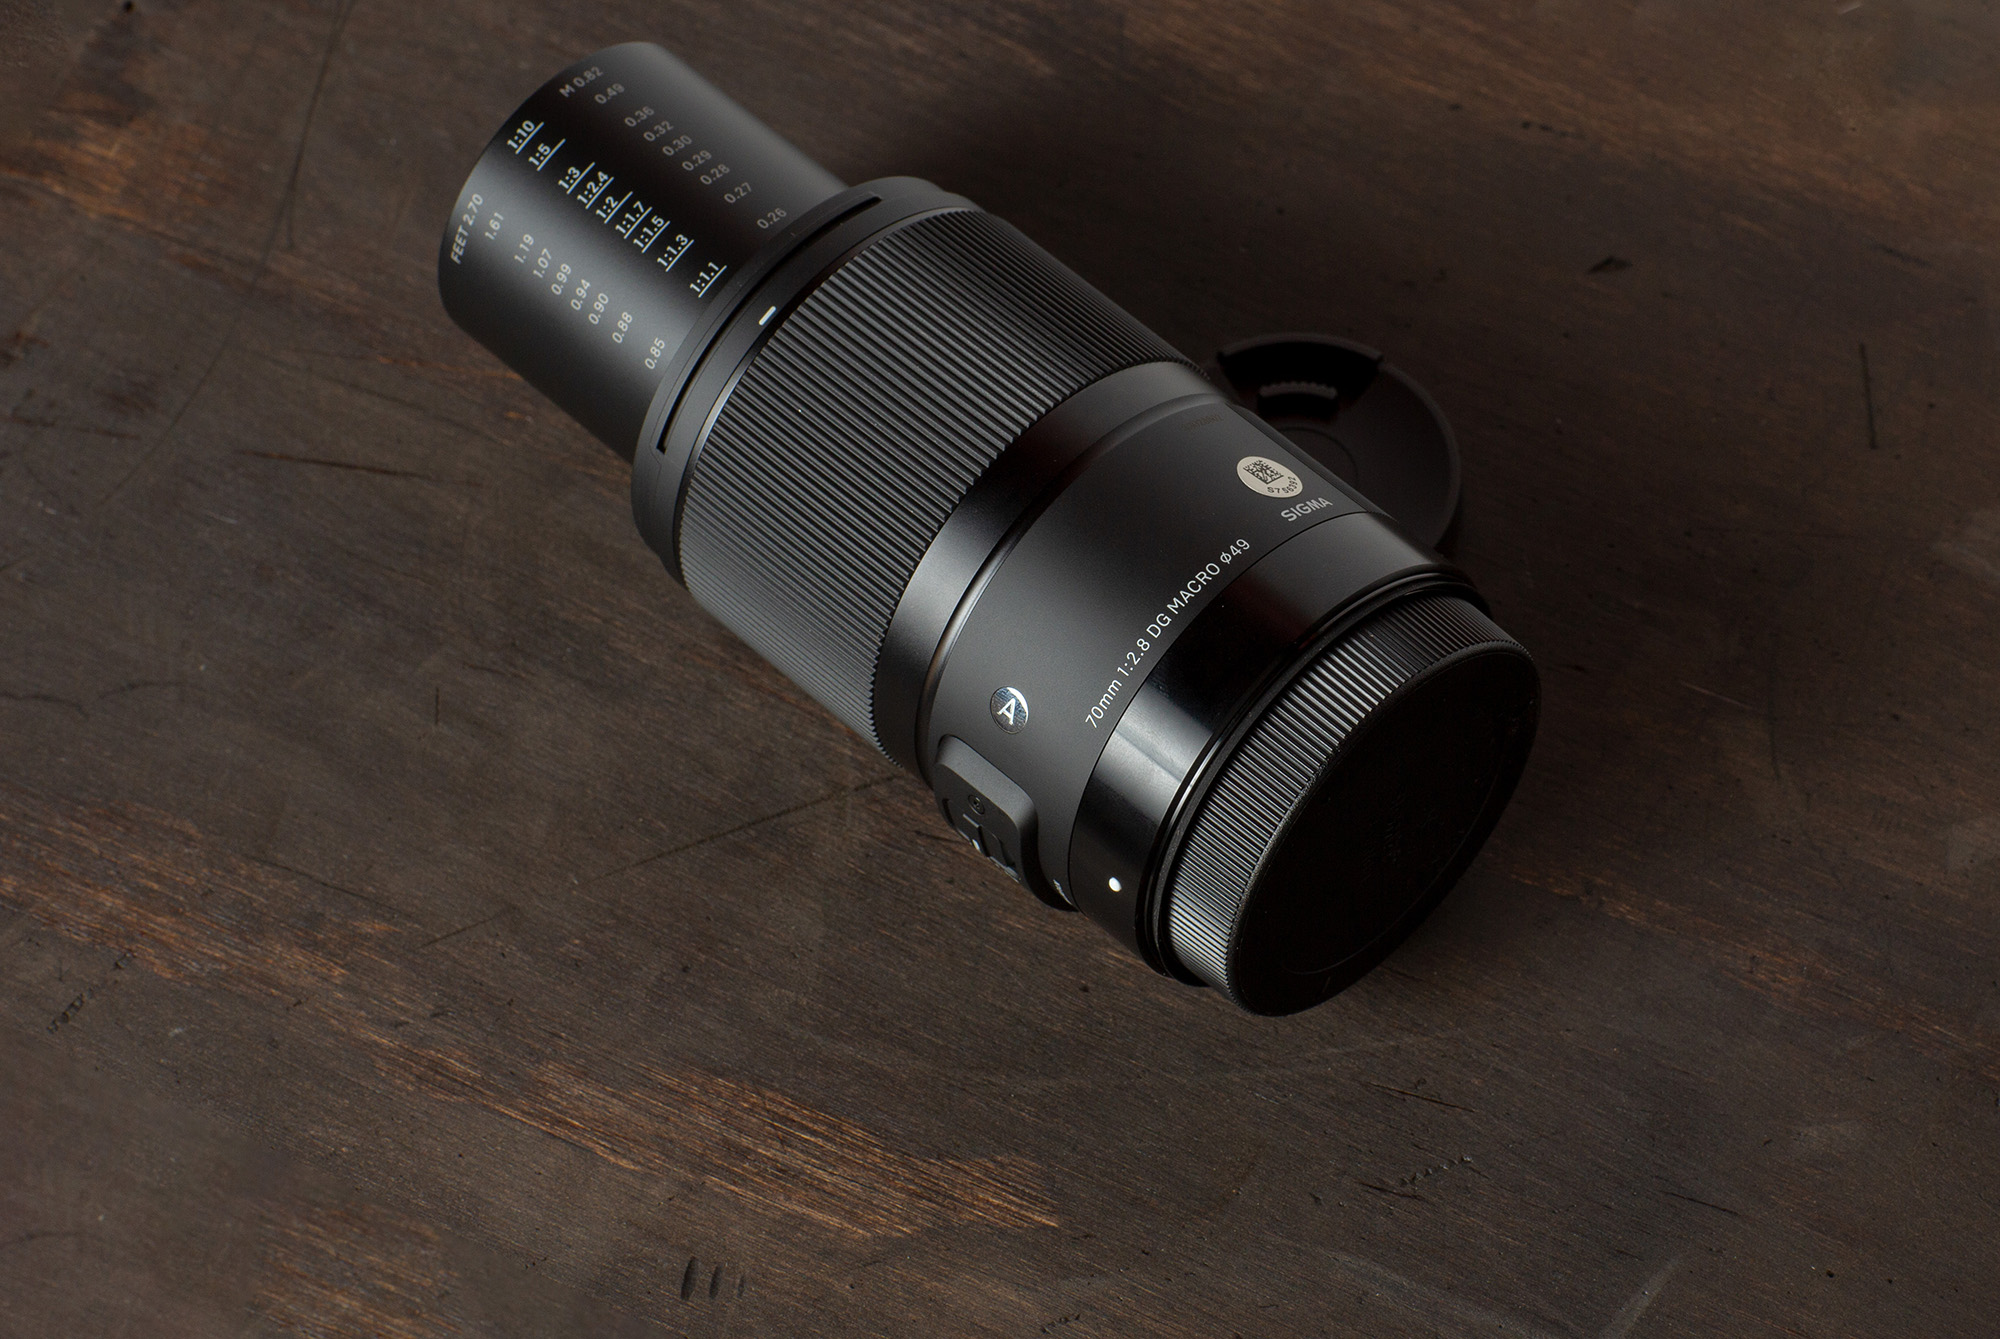 Sigma 70mm f/2.8 Macro Art Series Reviewed